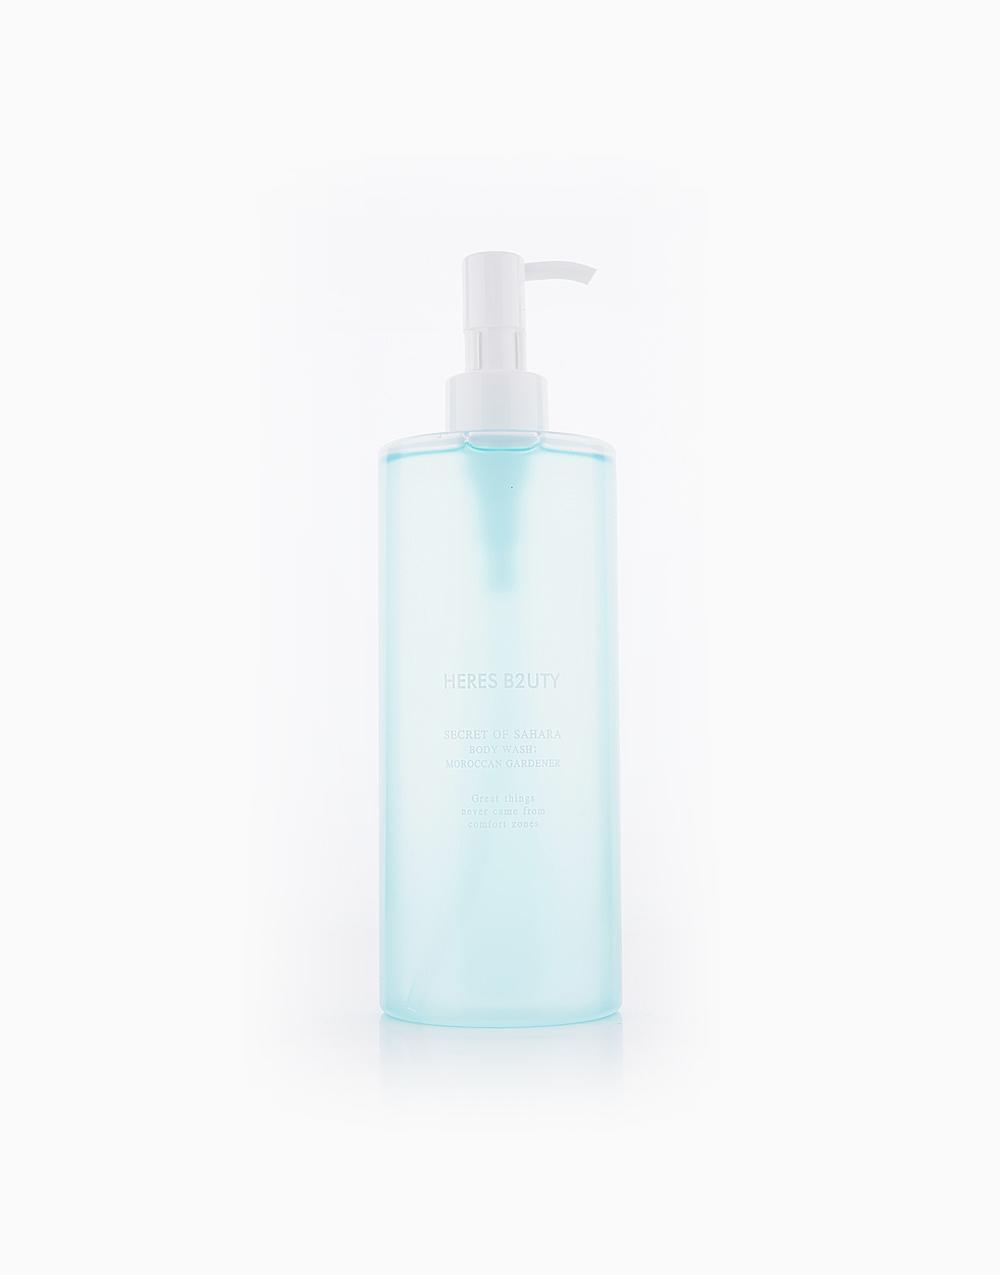 Fragrant Body Wash in Maldives by Here's B2uty